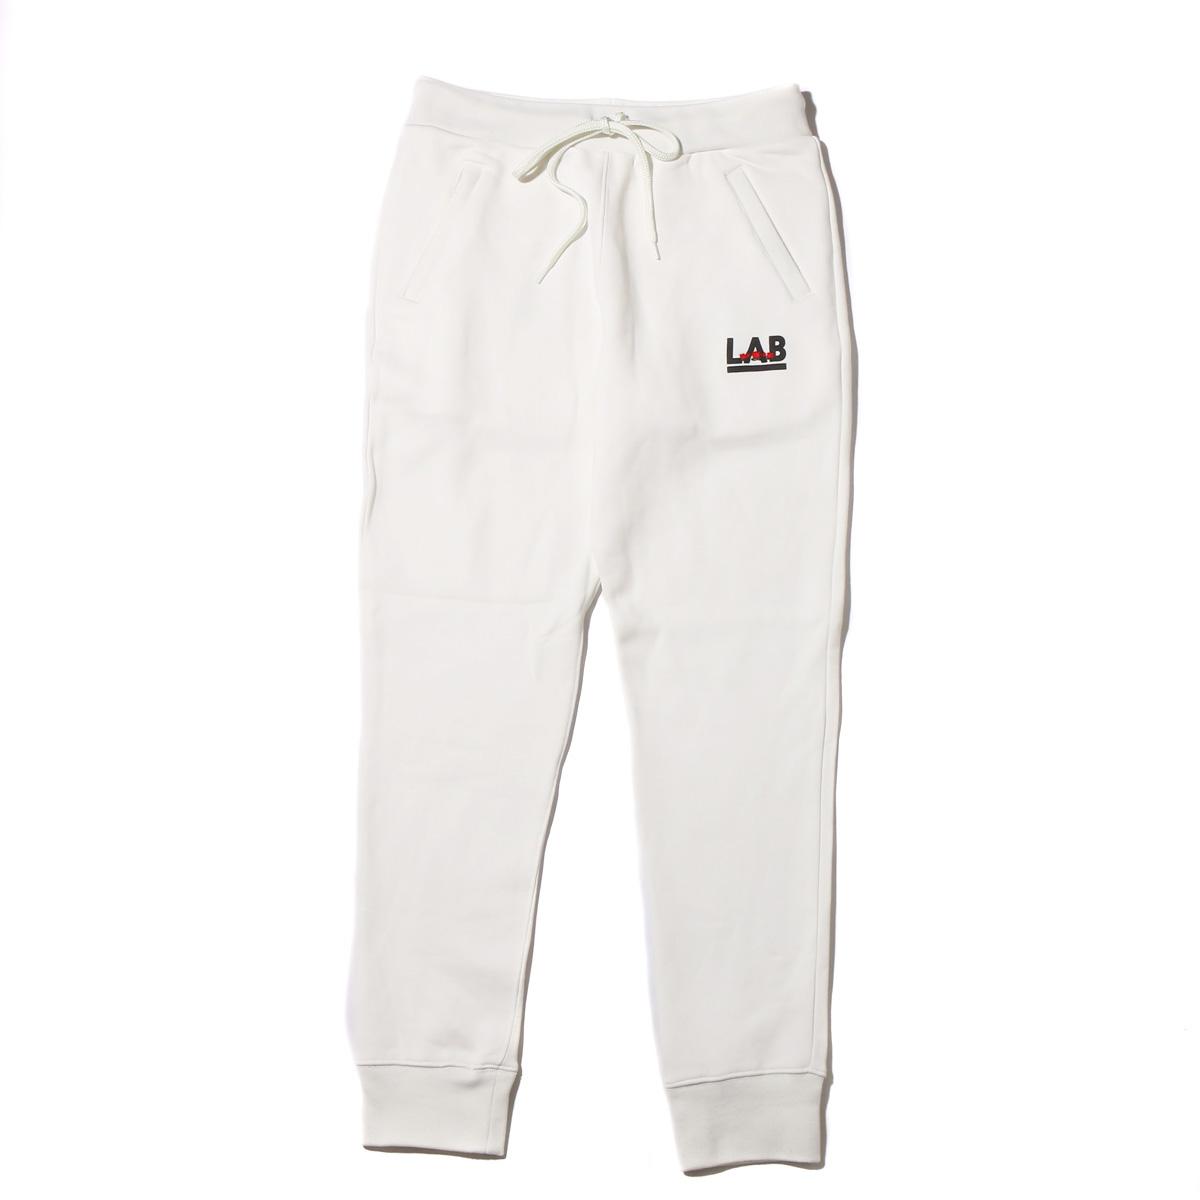 ATMOS LAB ROSE EMBROIDERY SWEAT PANTS(アトモス ラボ ローズ エンブロイダリー スウェット パンツ)(WHITE)18SP-I